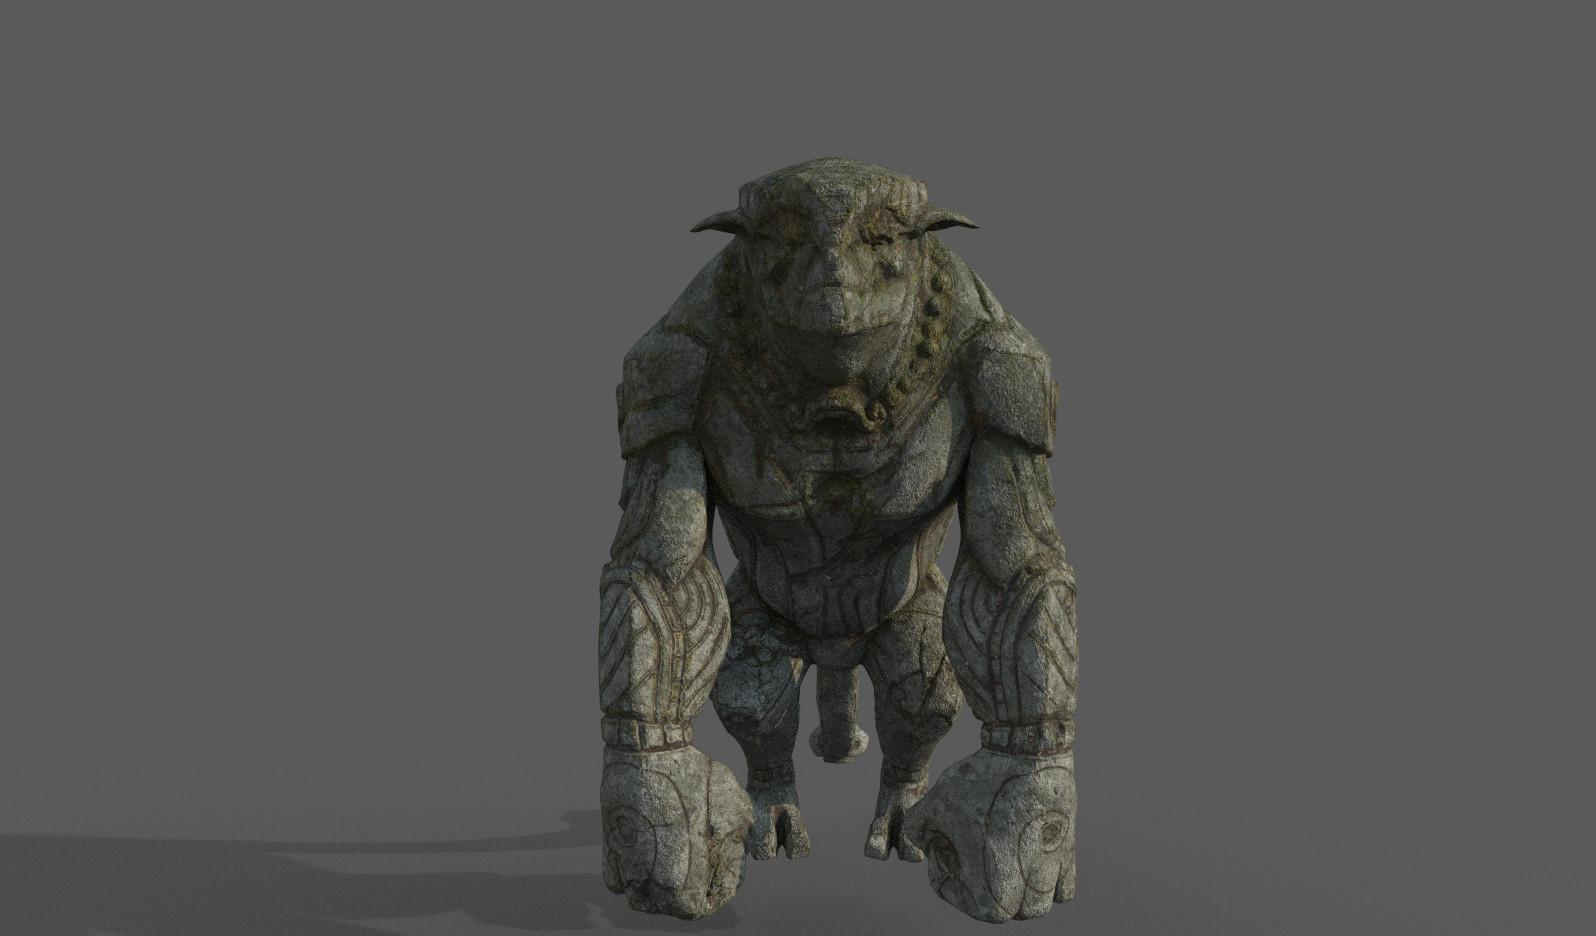 Darko mitev beast statuev1 02